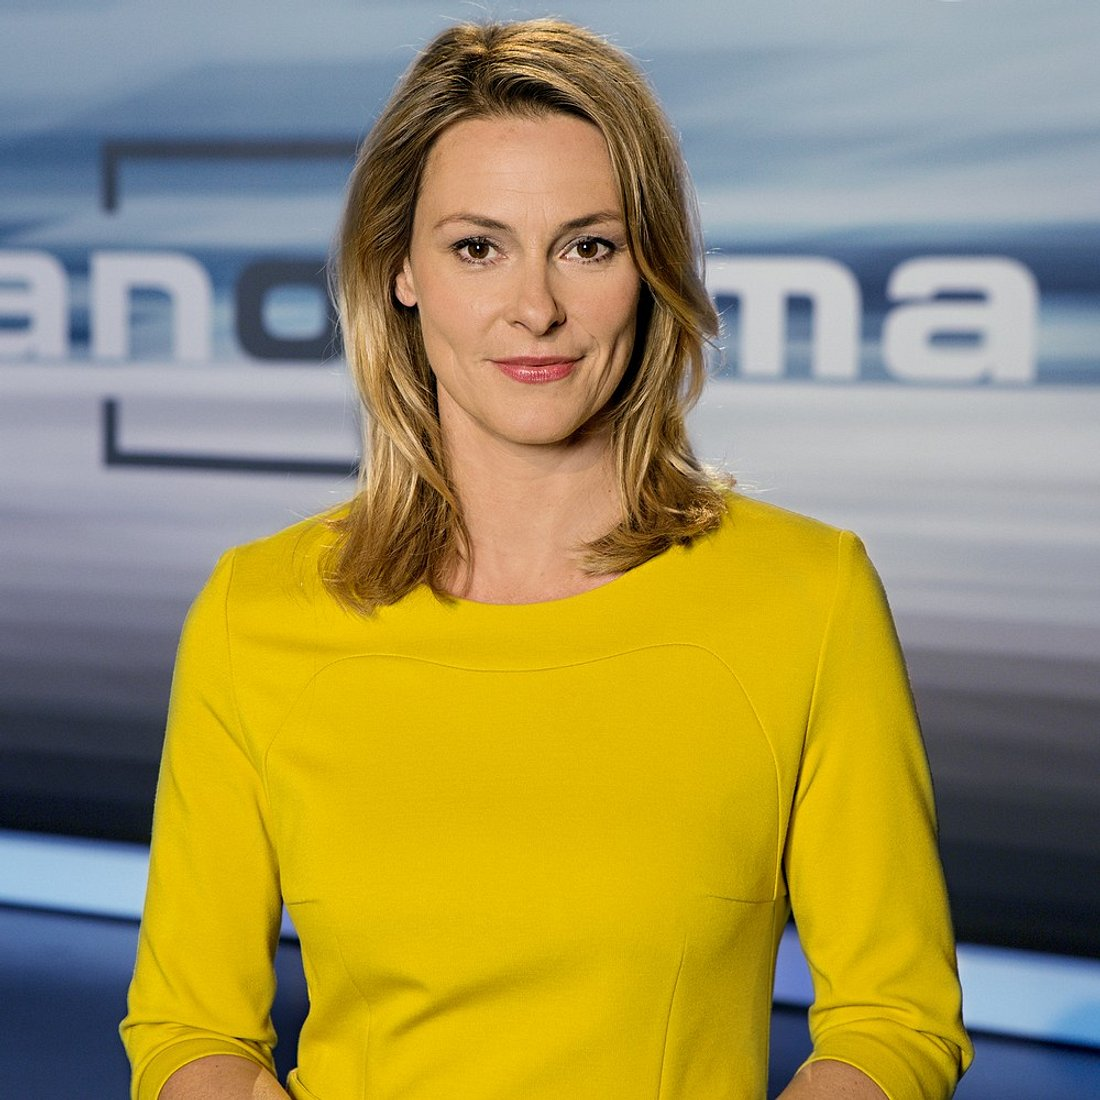 Anja Reschke: Die ARD-Moderatorin wird bedroht!